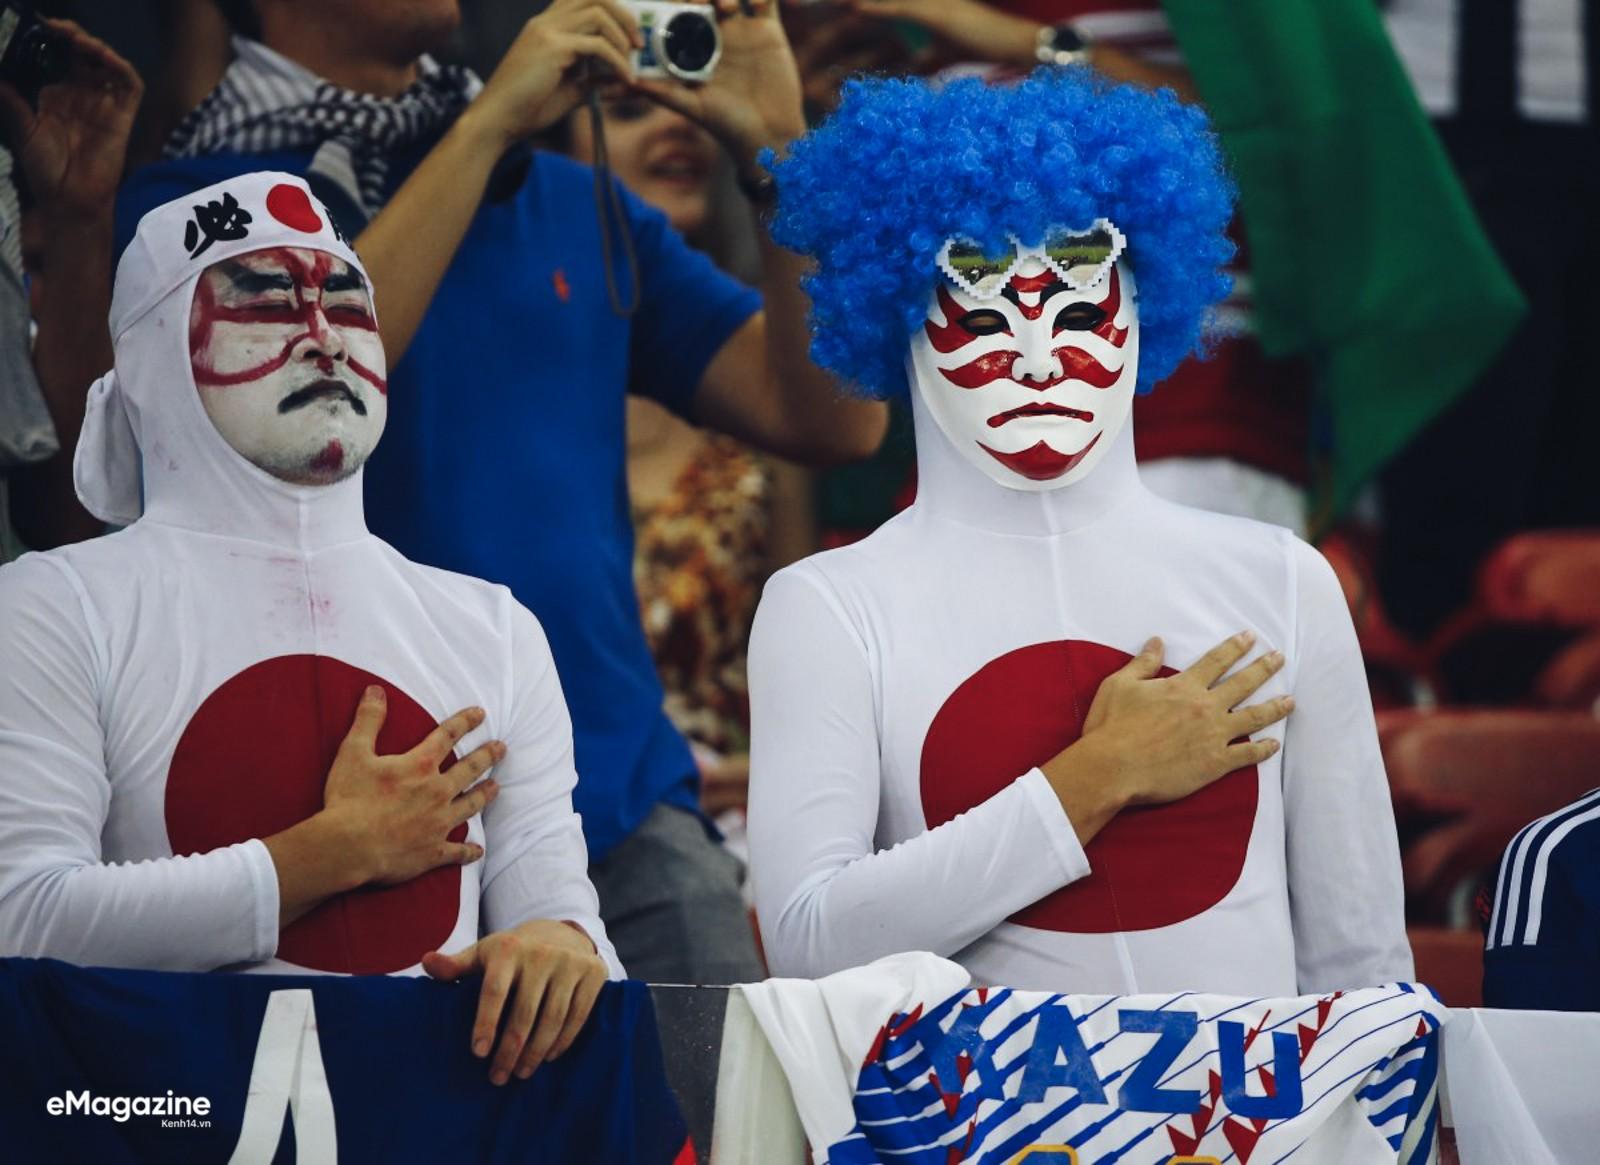 japansamuraiguyscraziestfansat2014fifaworldcup15290141577511250082283a3c9cdc21fcp.jpg